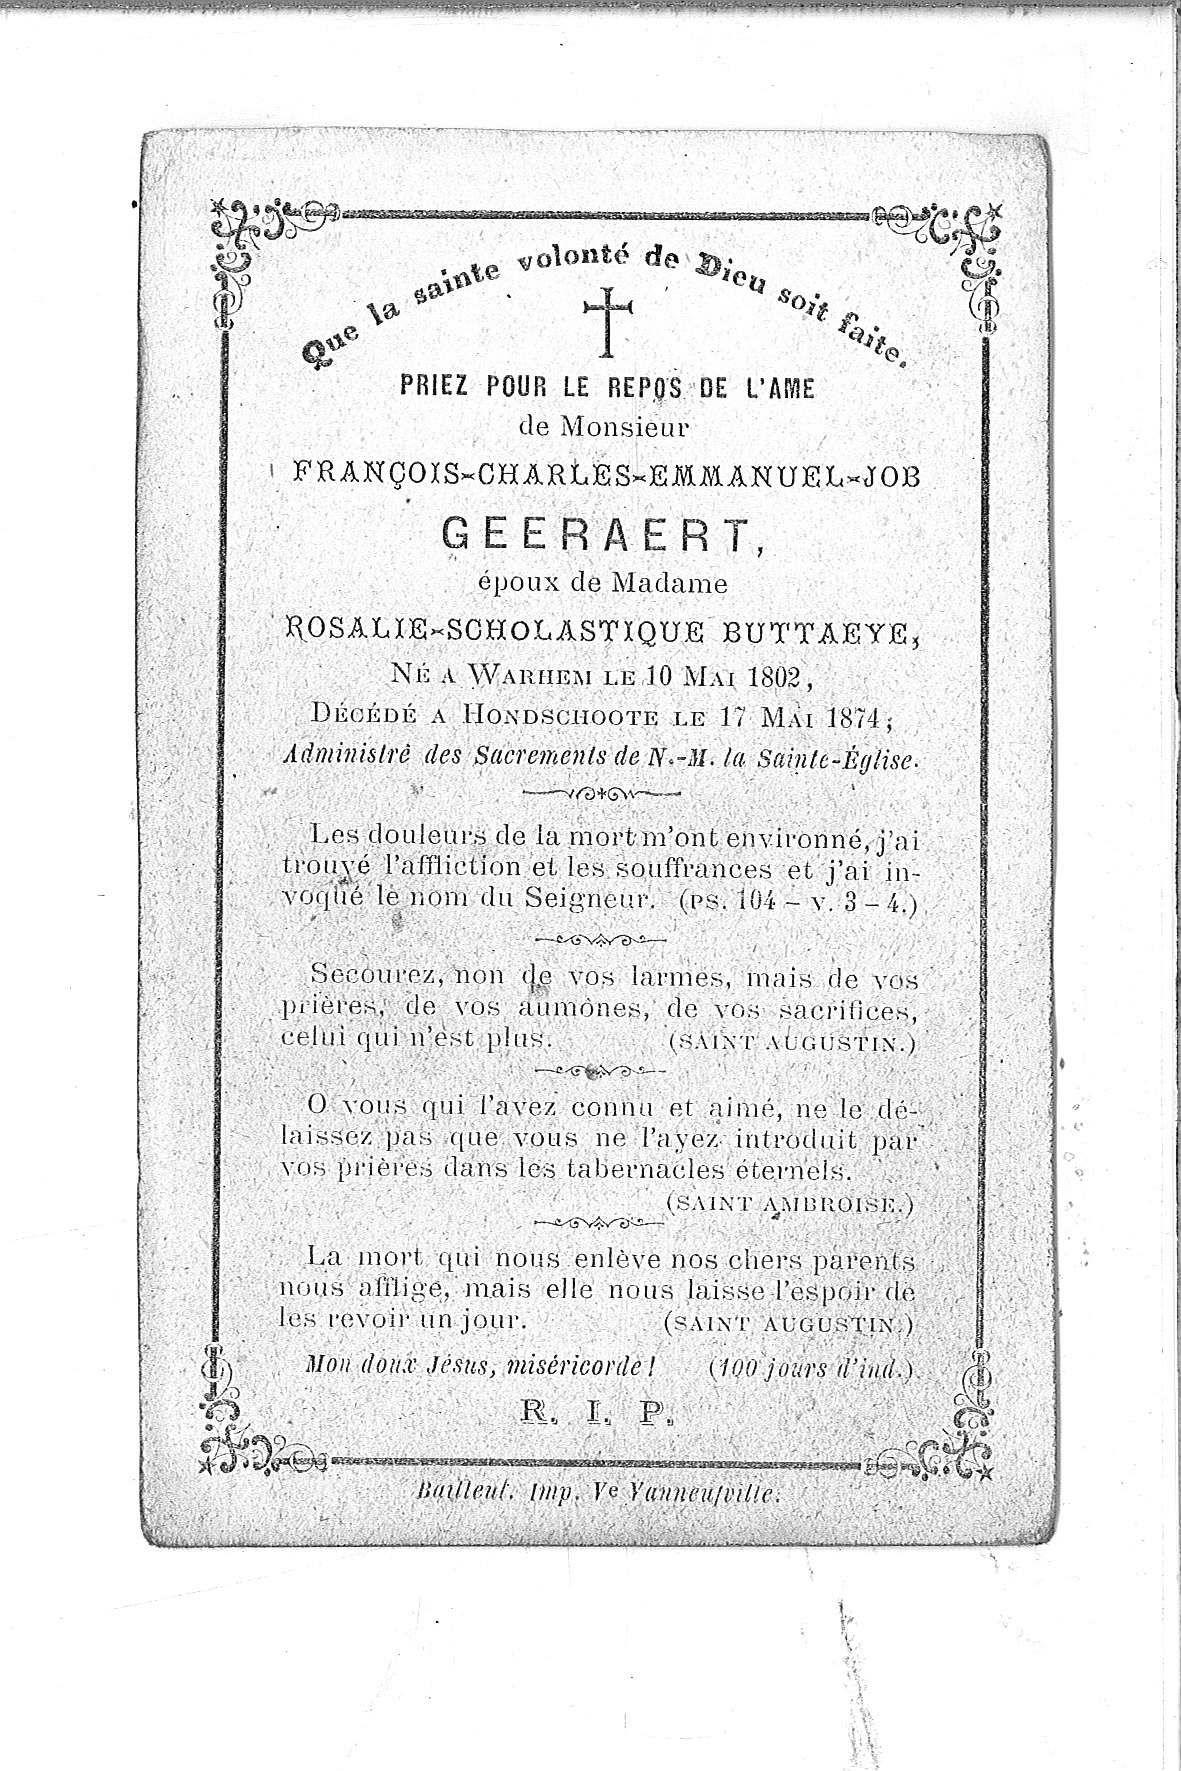 Francois-Charles-Emmanuel-Job(1874)20130819160133_00007.jpg